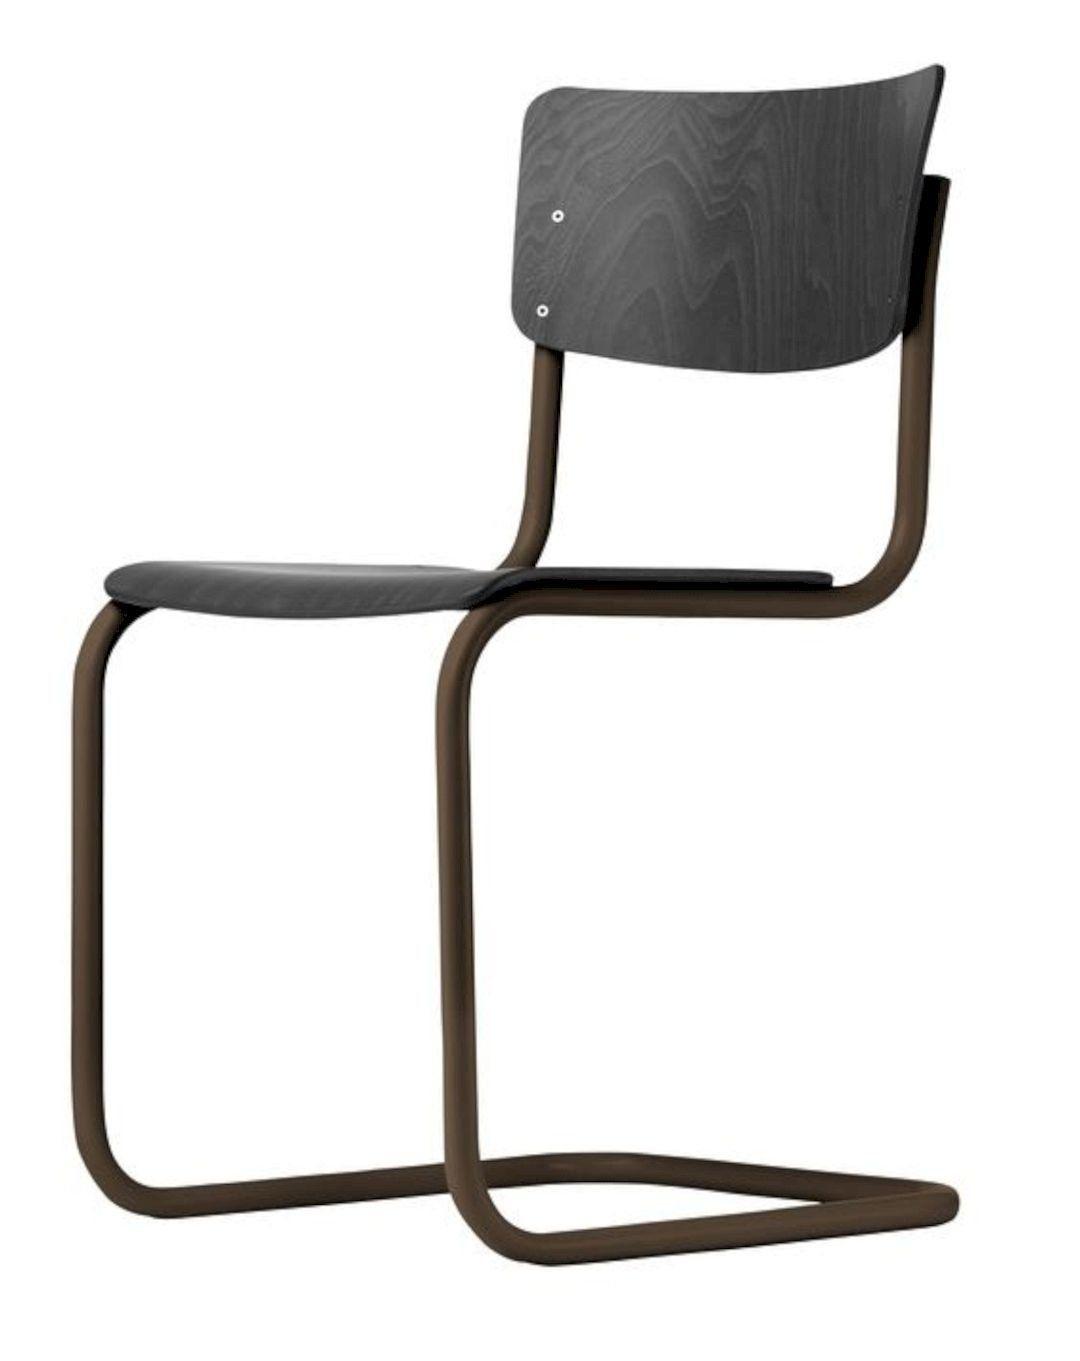 16 Beautiful Cantilever Chair Designs Marcel breuer Simple